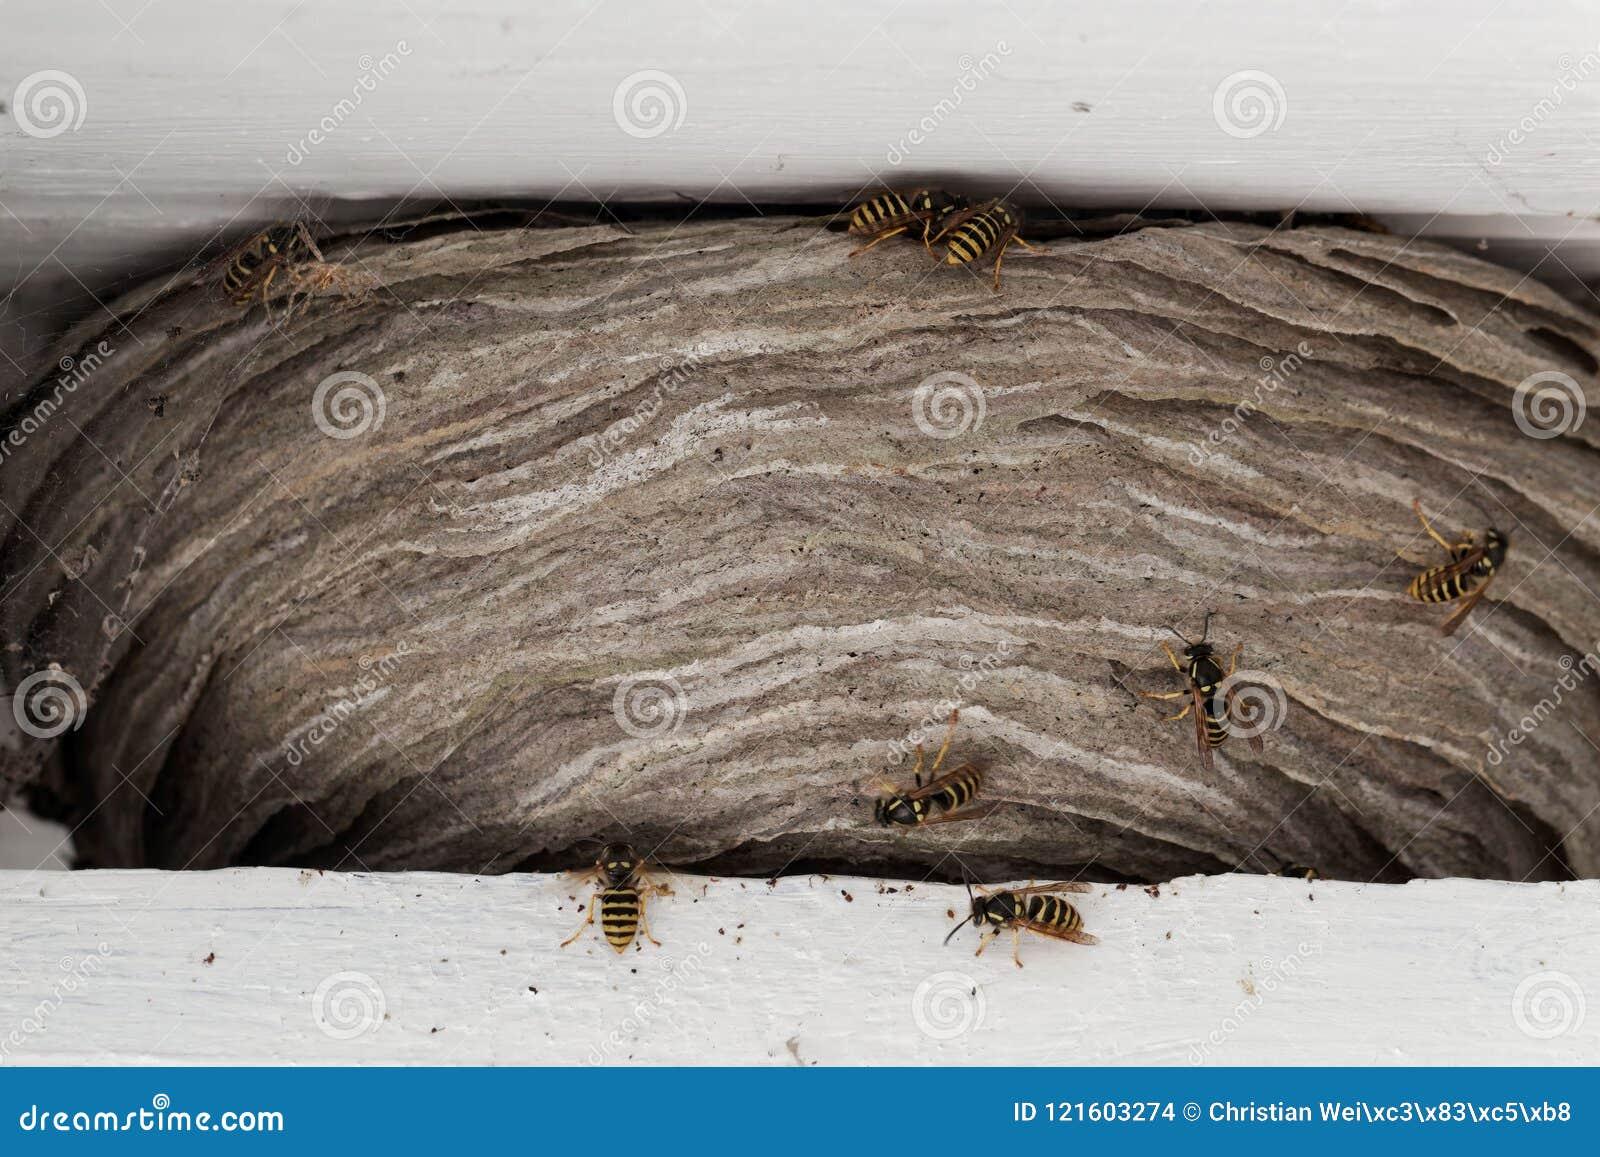 wespennest unter dem dach great wespe am ausflugloch with. Black Bedroom Furniture Sets. Home Design Ideas